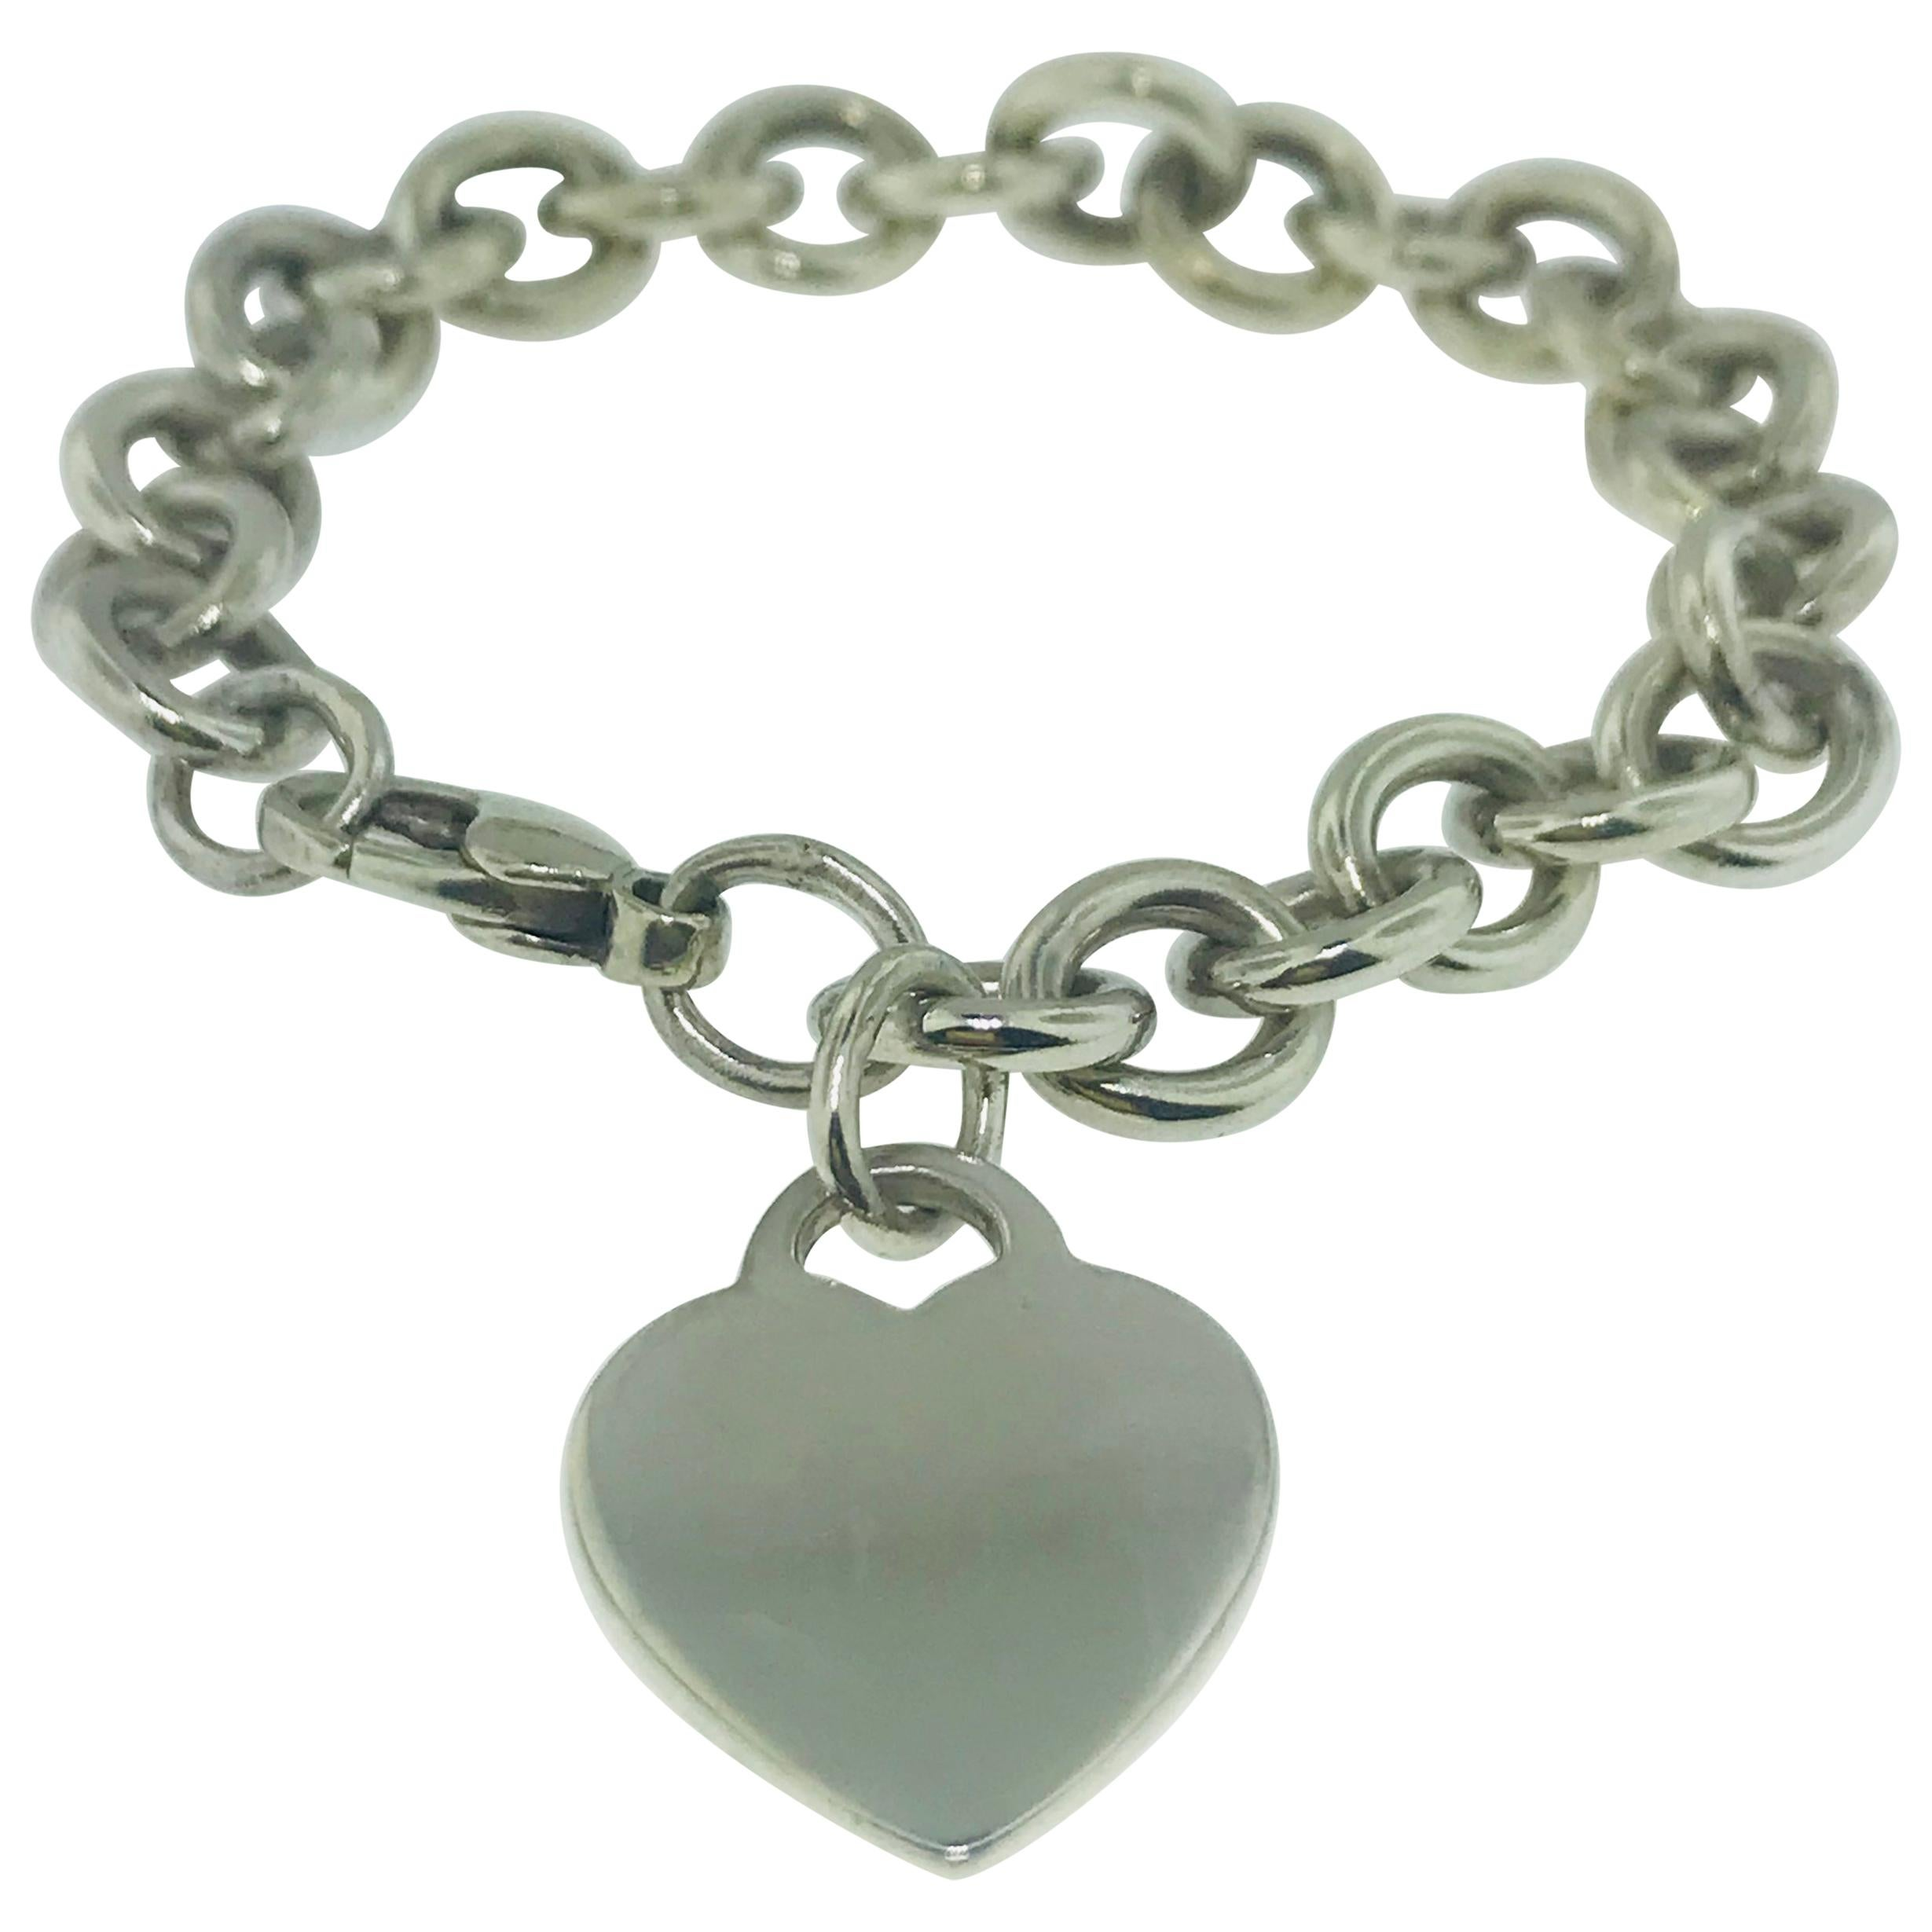 cda1c7a2fe2ae Tiffany & Co. 18 Karat Yellow Gold Heart Tag Charm Bracelet